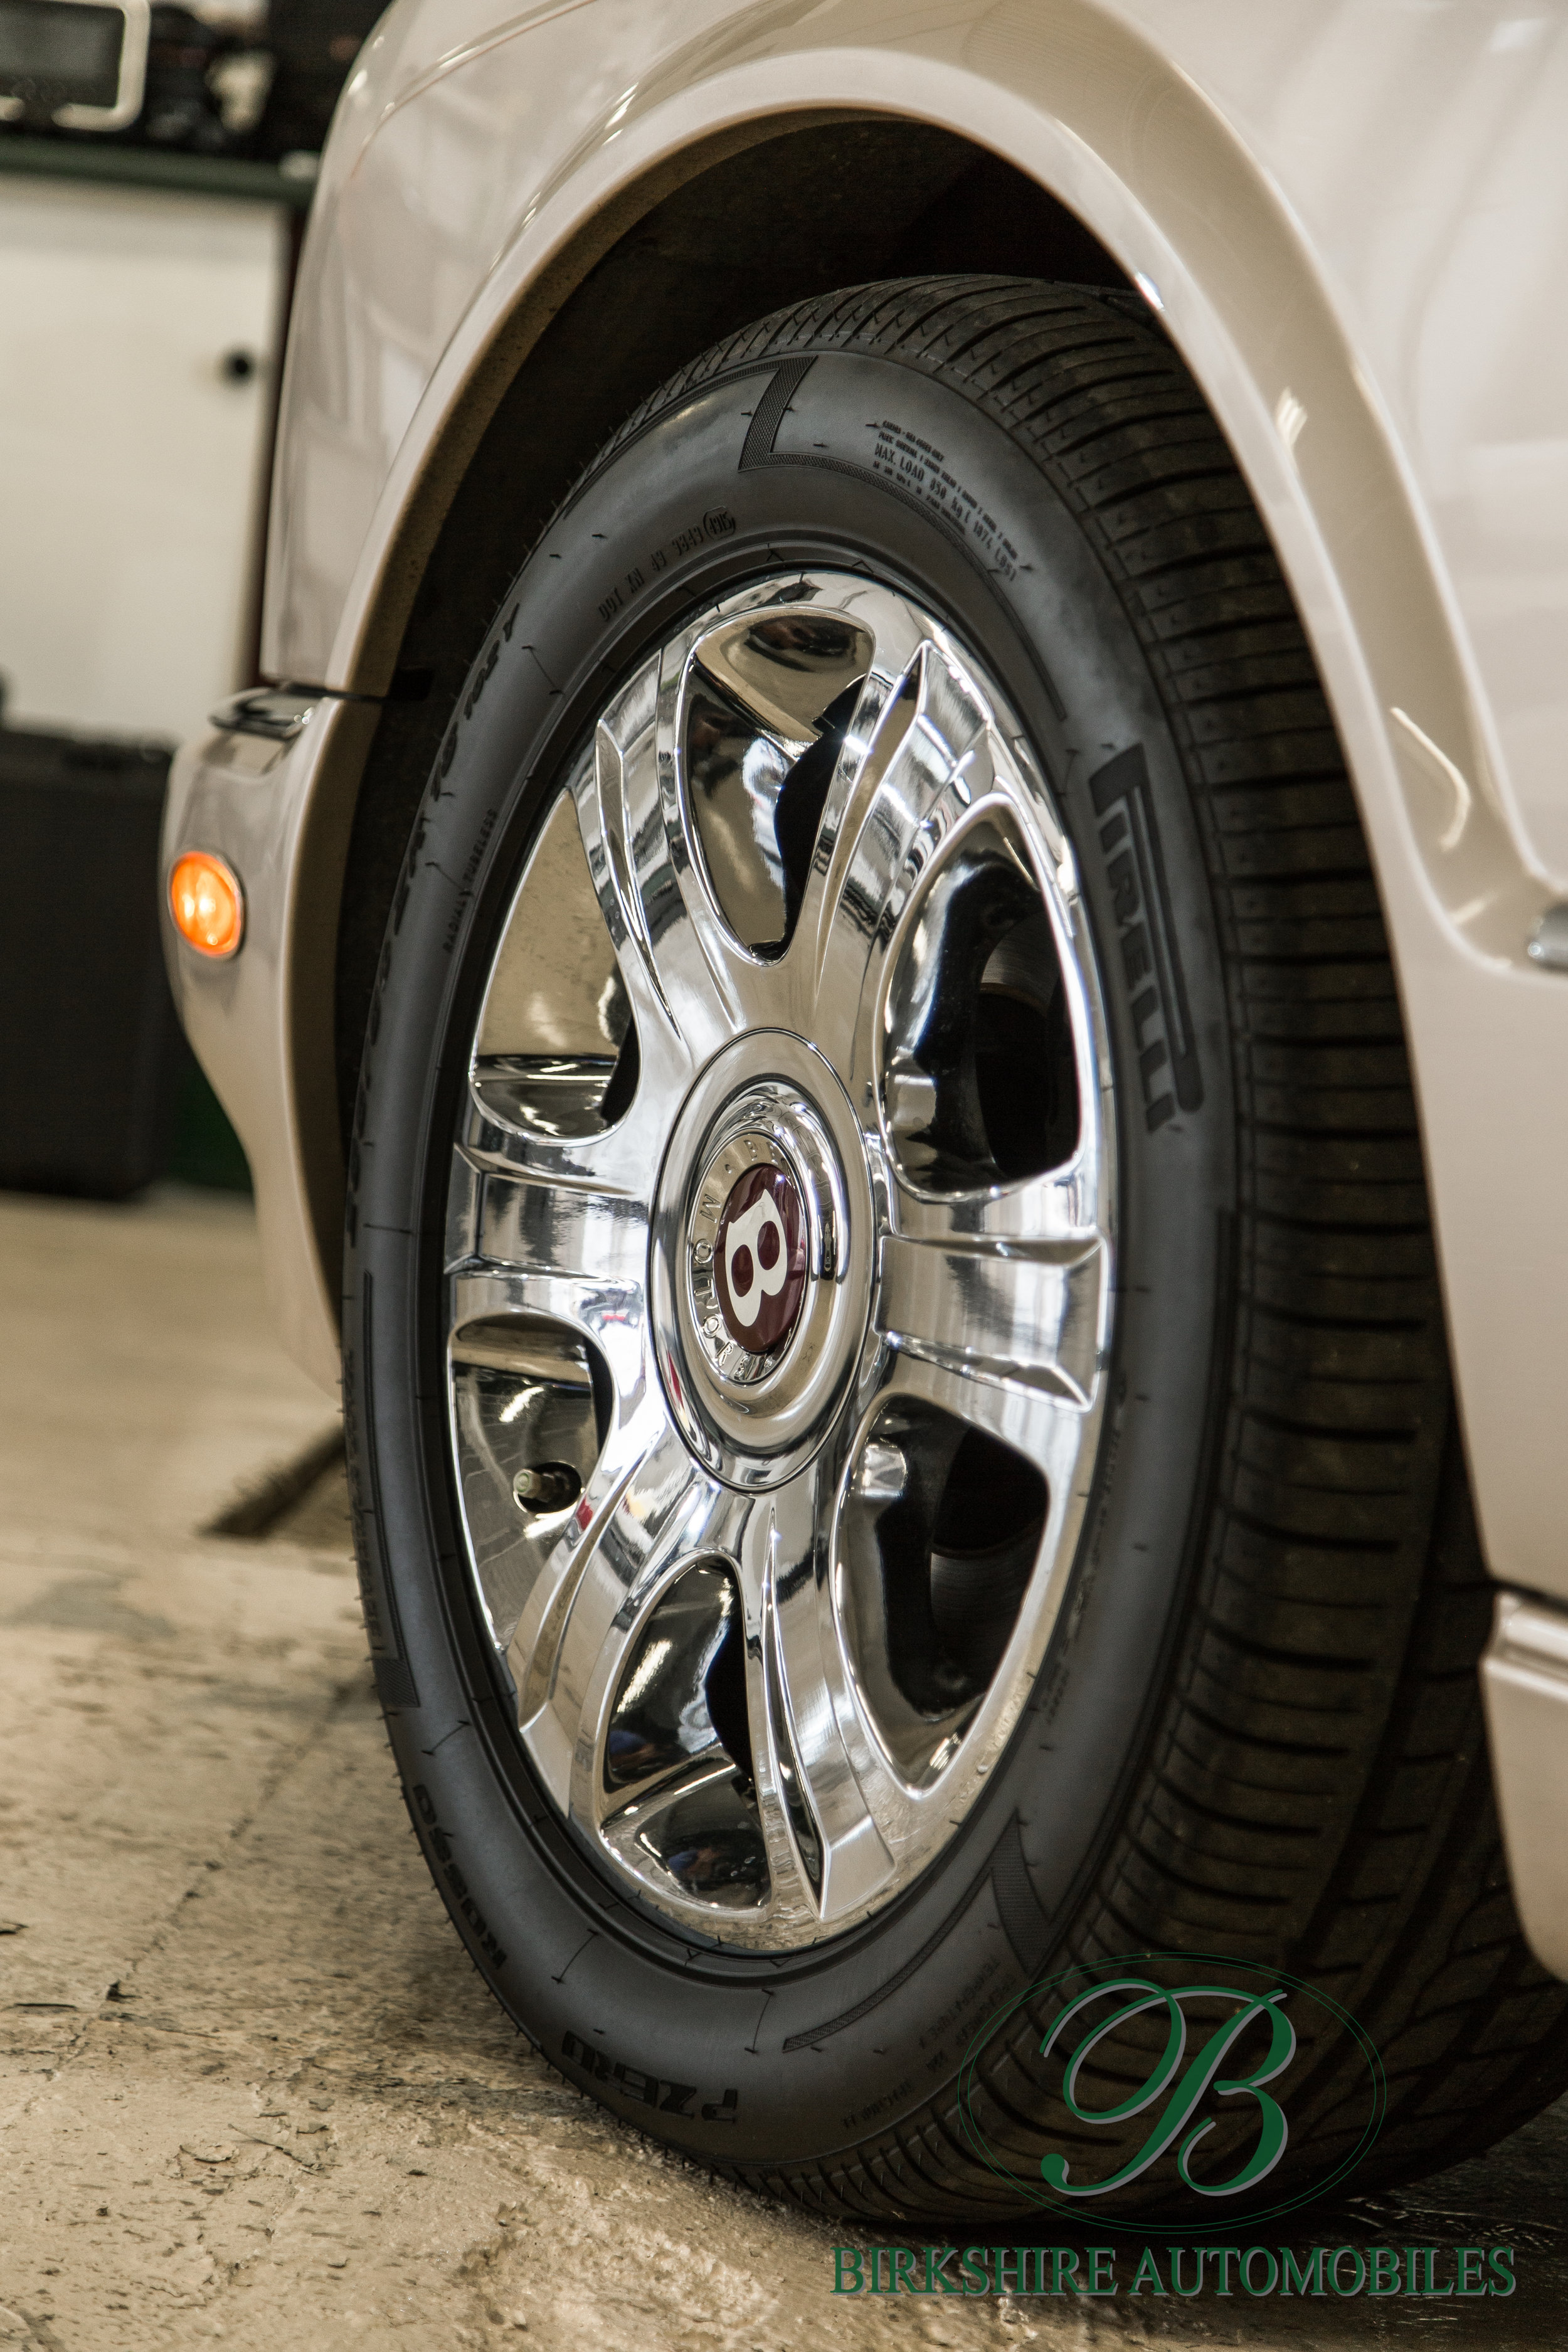 Birkshire Automobiles-341.jpg